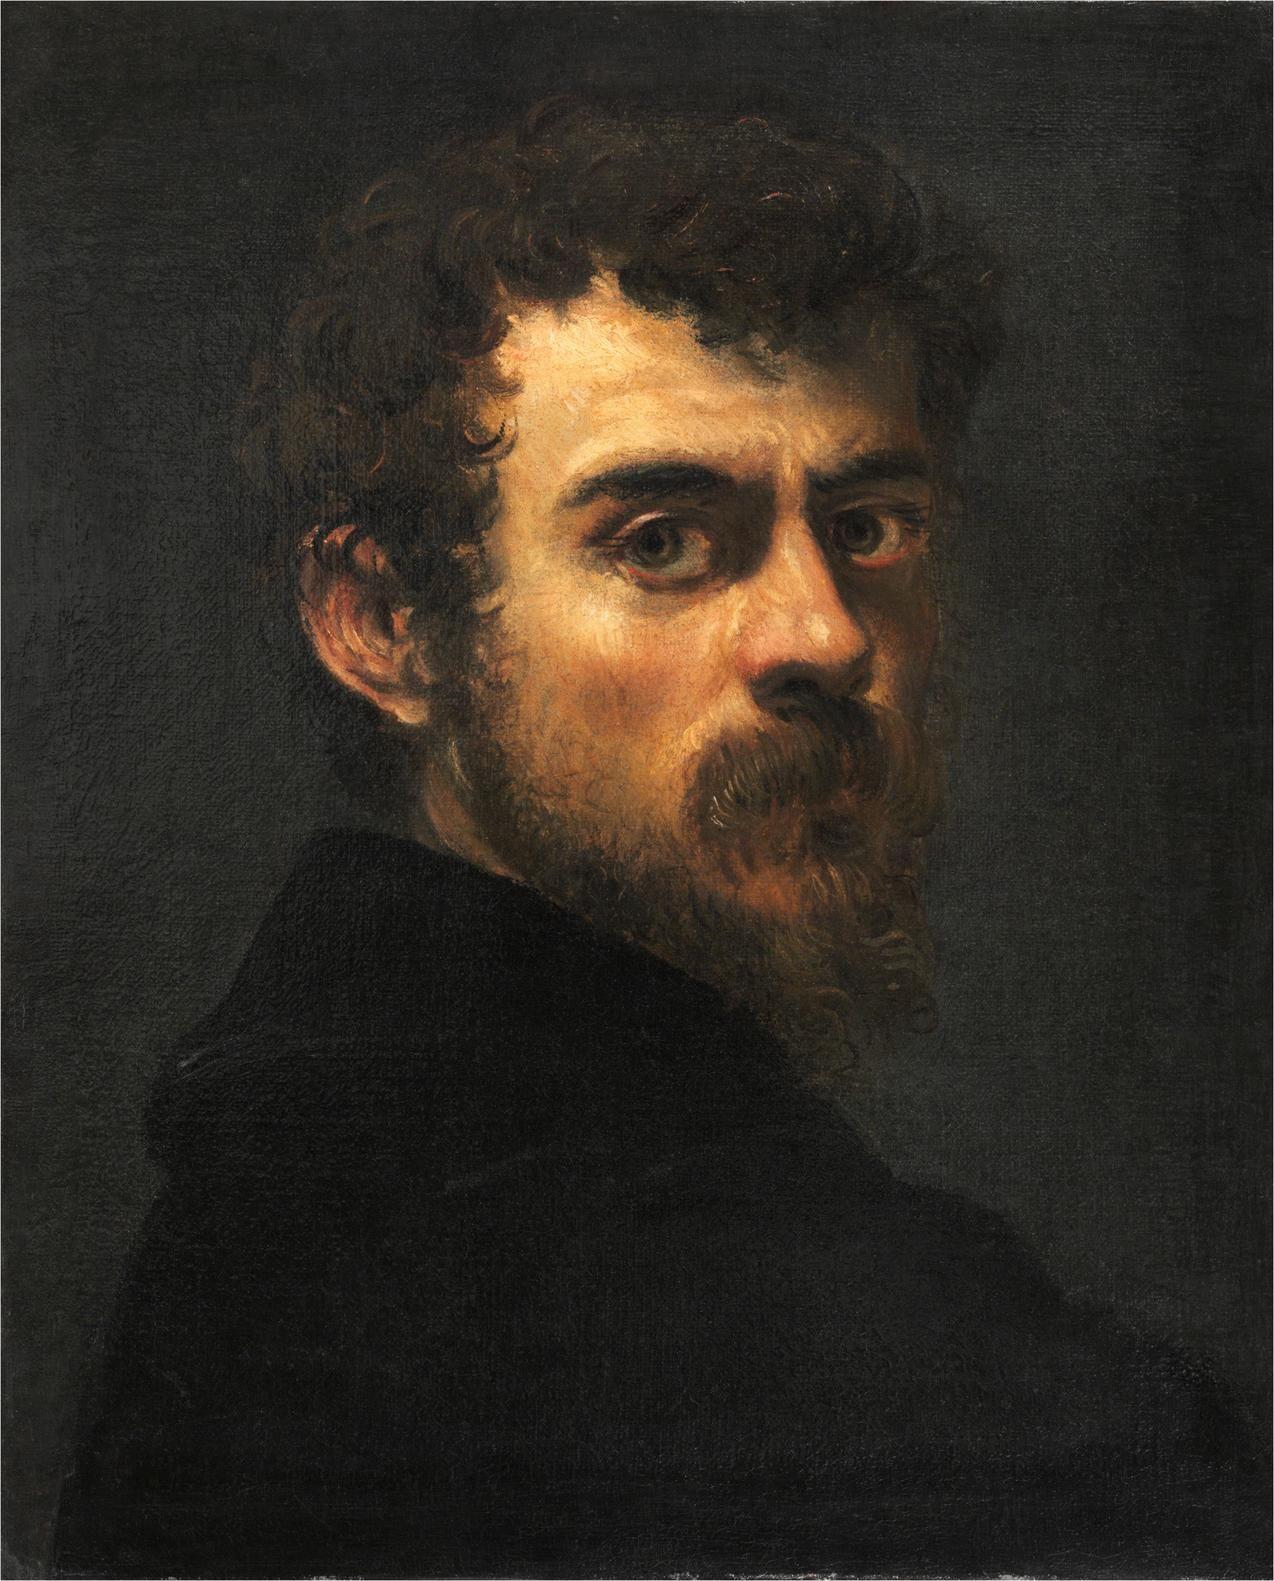 Tintoretto 'Self-Portrait' (c. 1546/47) PHOTO: THE PHILADELPHIA MUSEUM OF ART/A